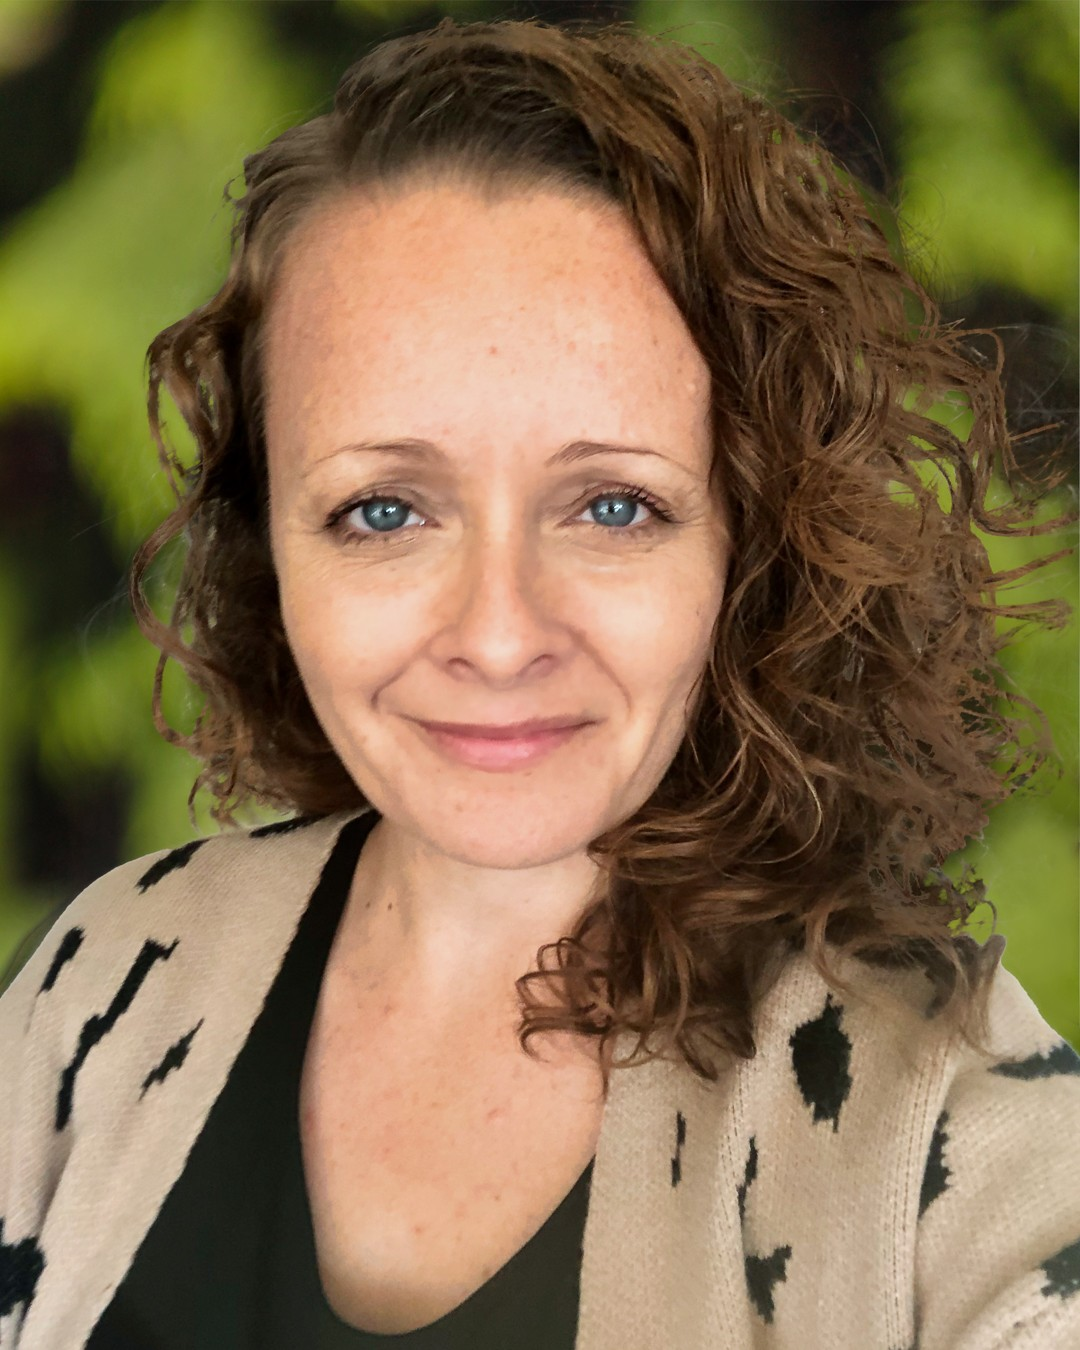 Kristen Cane, Director of Asset Management